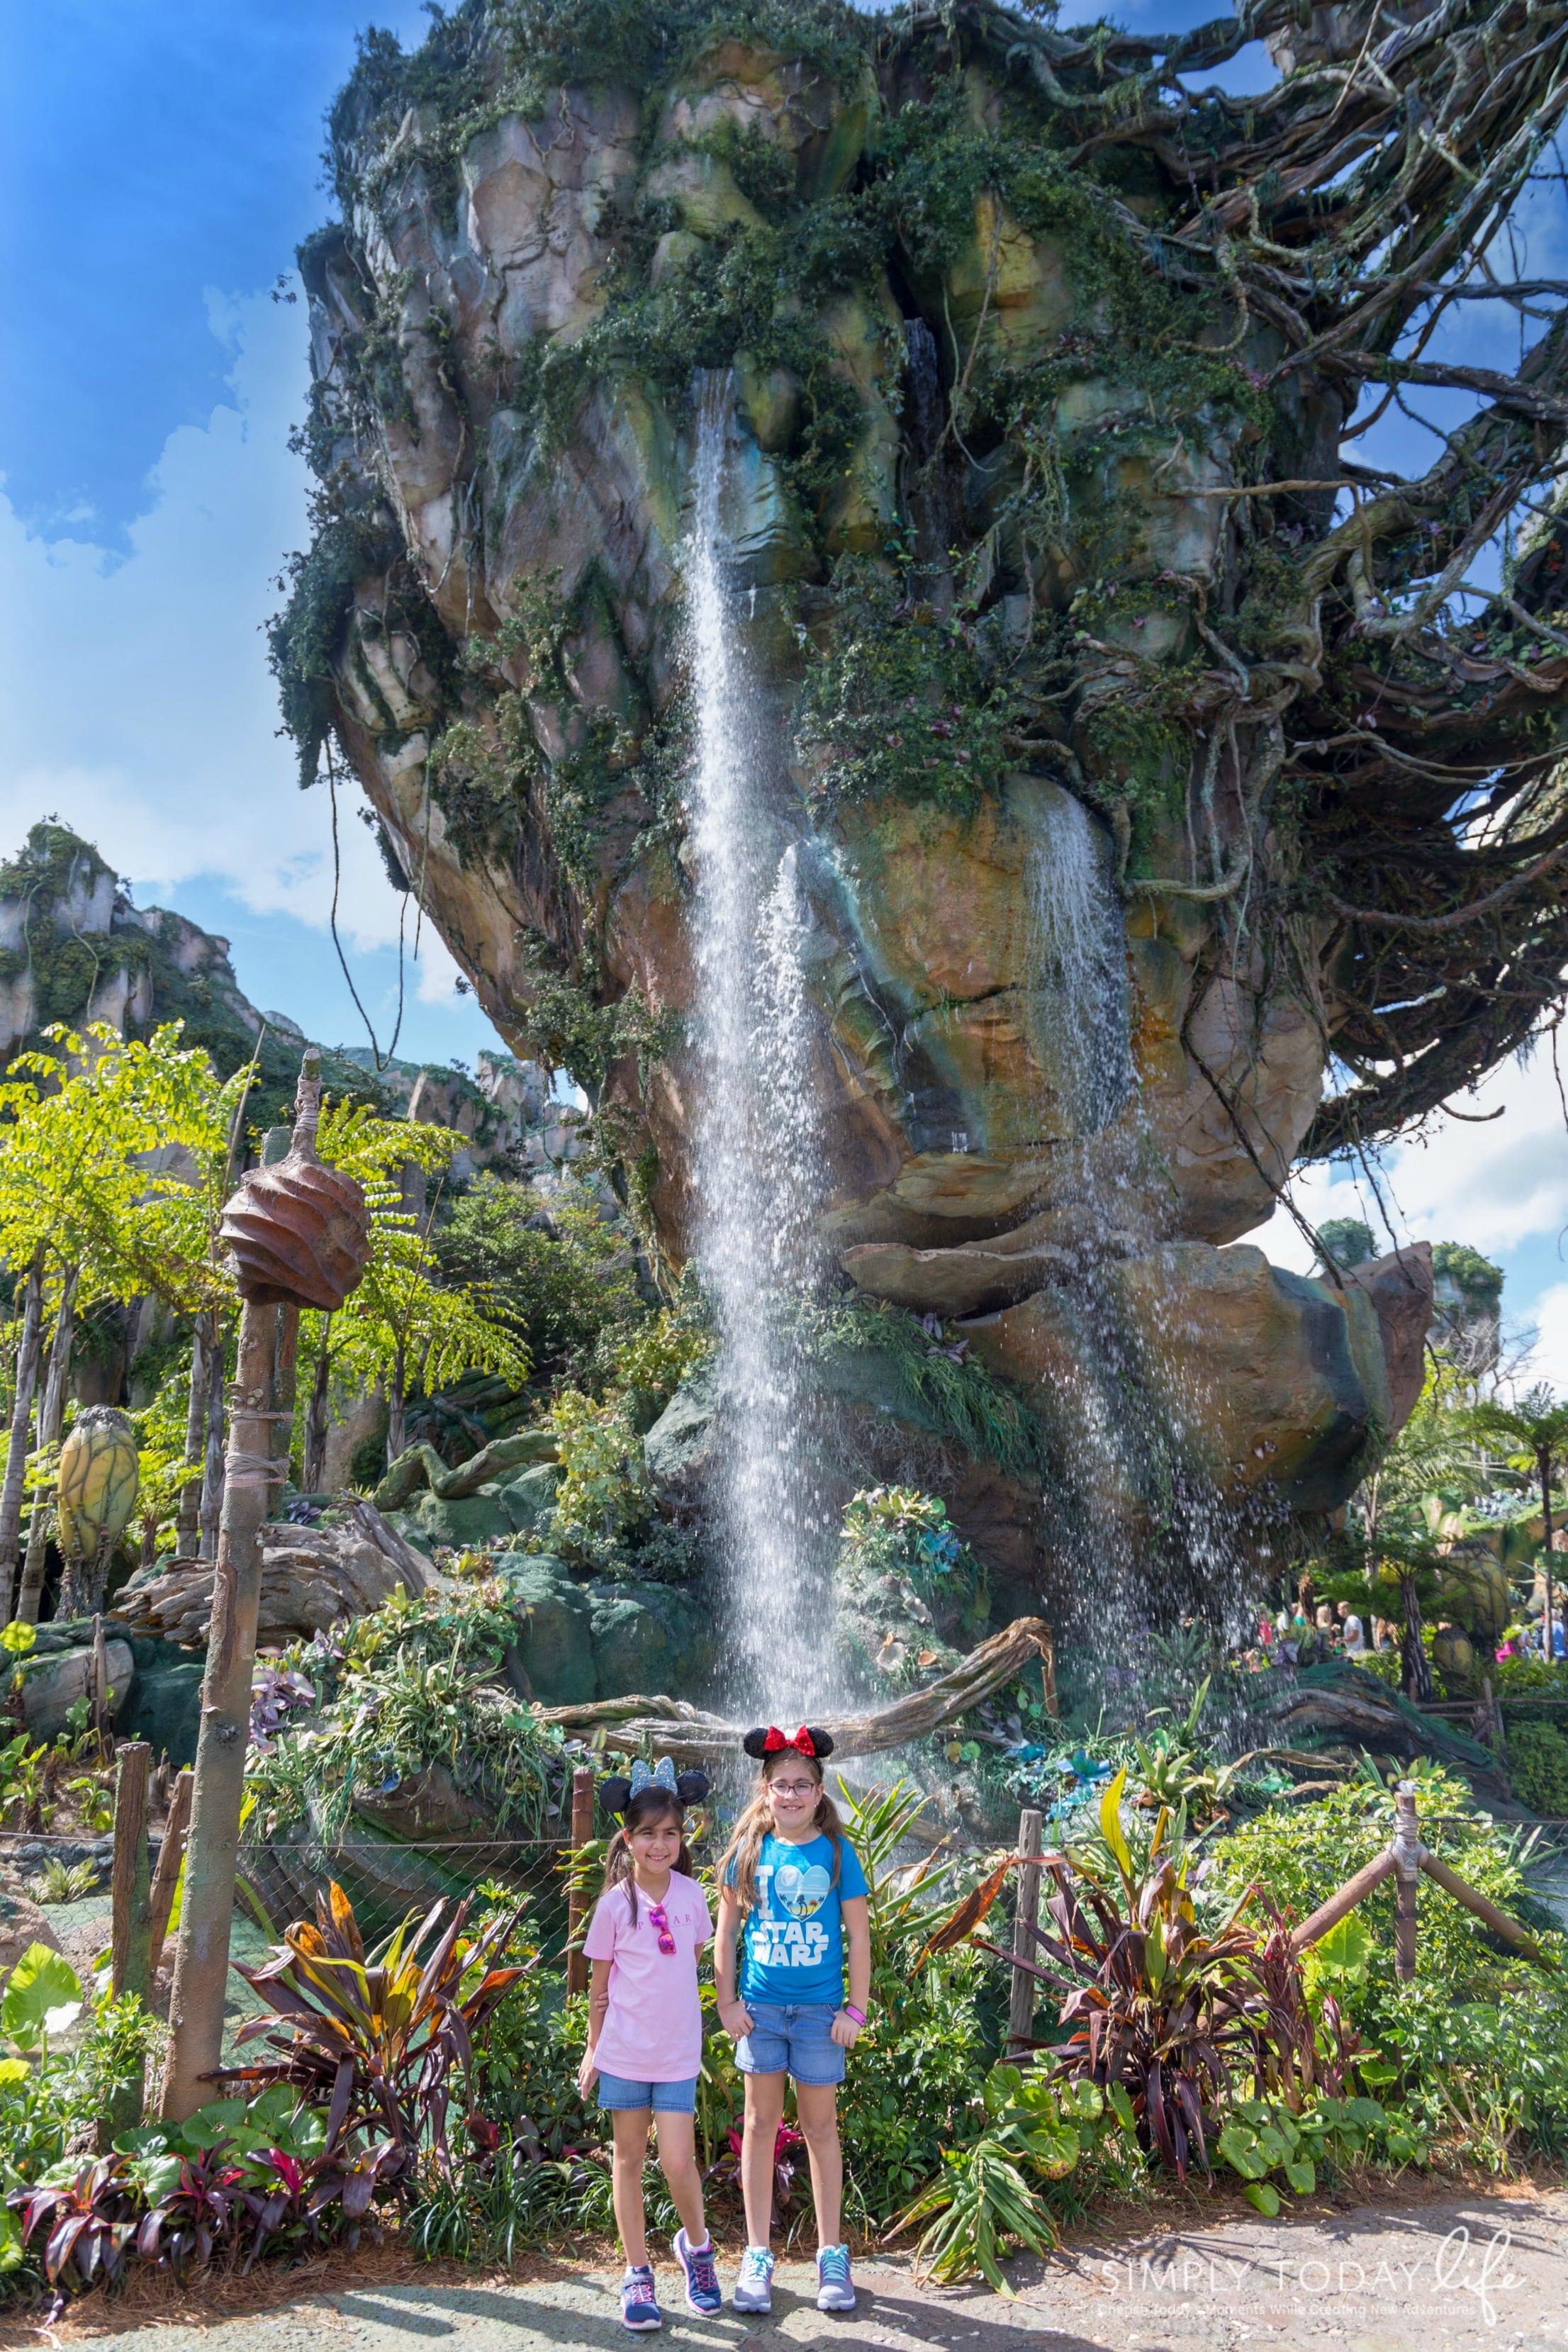 A Parents Guide To Visiting Disney Pandora with Kids - simplytodaylife.com